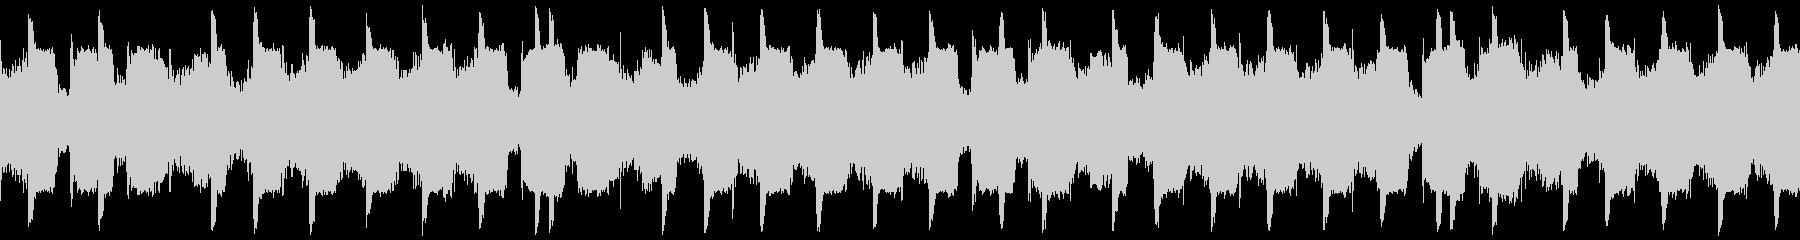 EDM Anthem Lead Synの未再生の波形